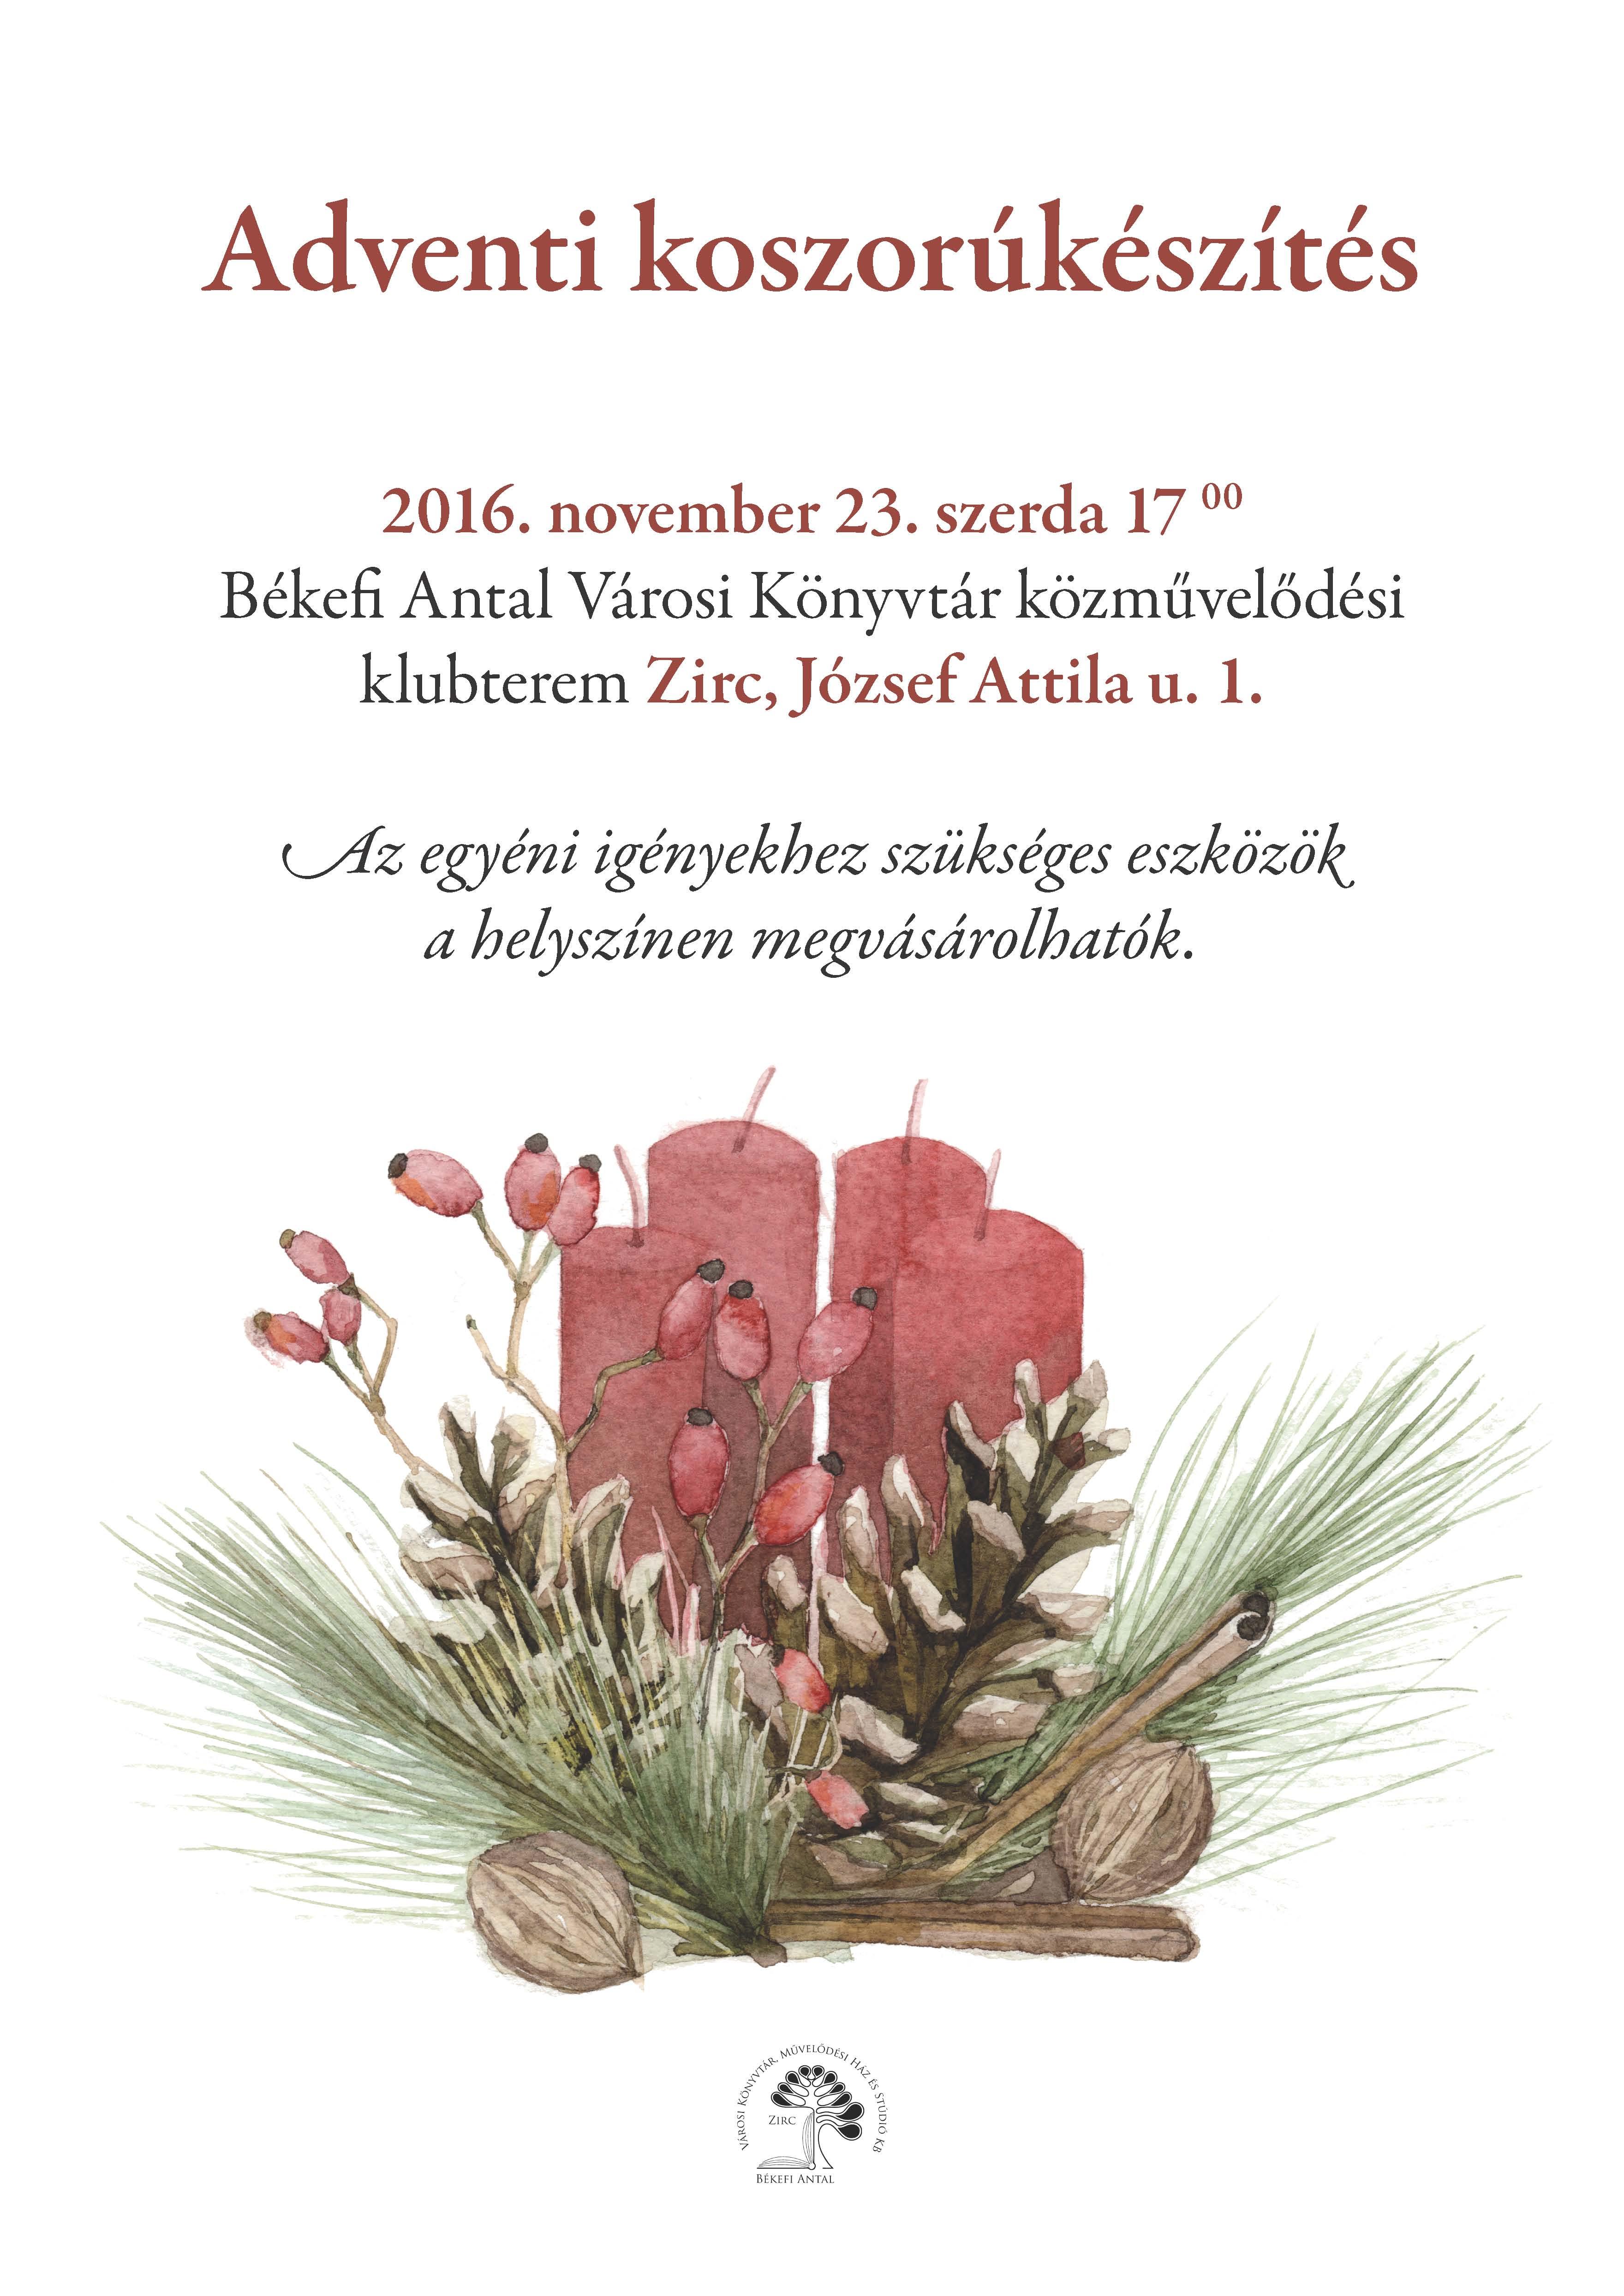 2016-11-23_adventi_koszorukeszites_a3.jpg